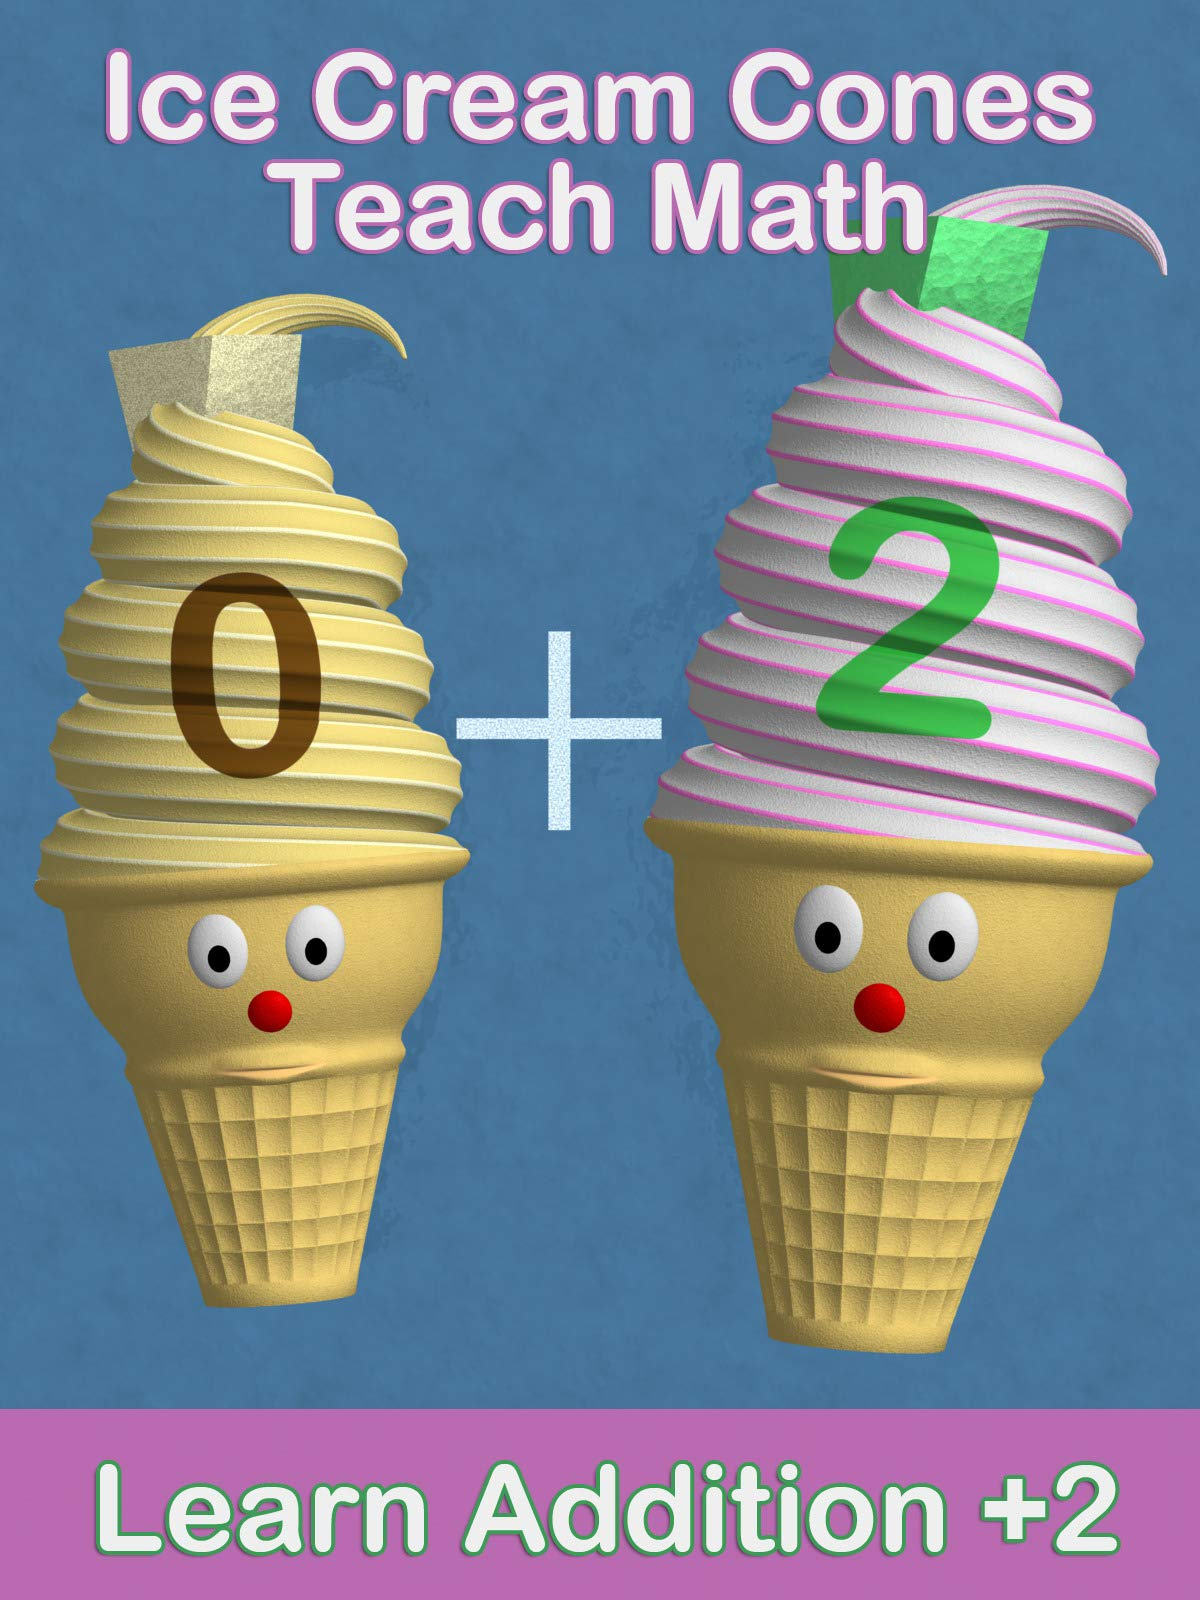 Ice Cream Cones Teach Math - Learn Addition +2 on Amazon Prime Instant Video UK